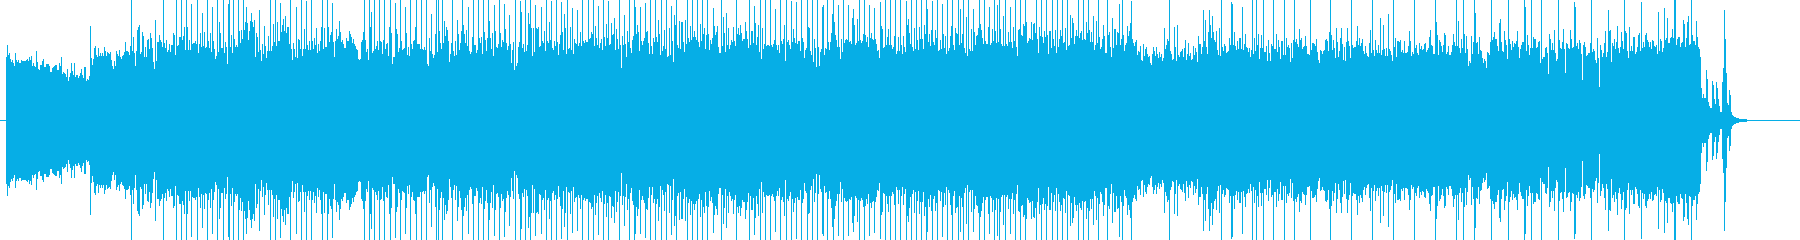 「HR/HM」「DARK系」BGM16の再生済みの波形